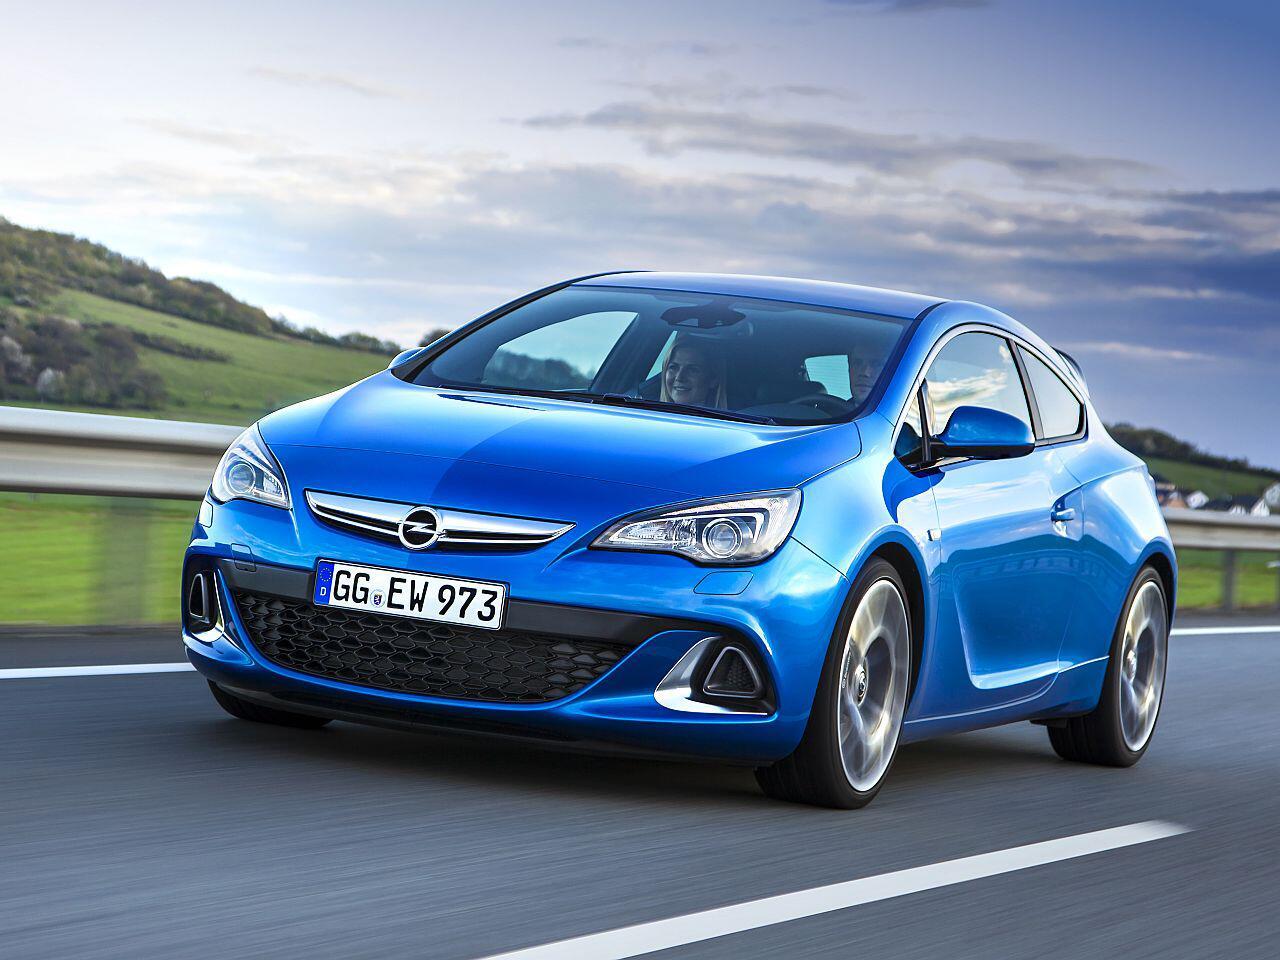 Bild zu Platz 7: Opel Astra OPC